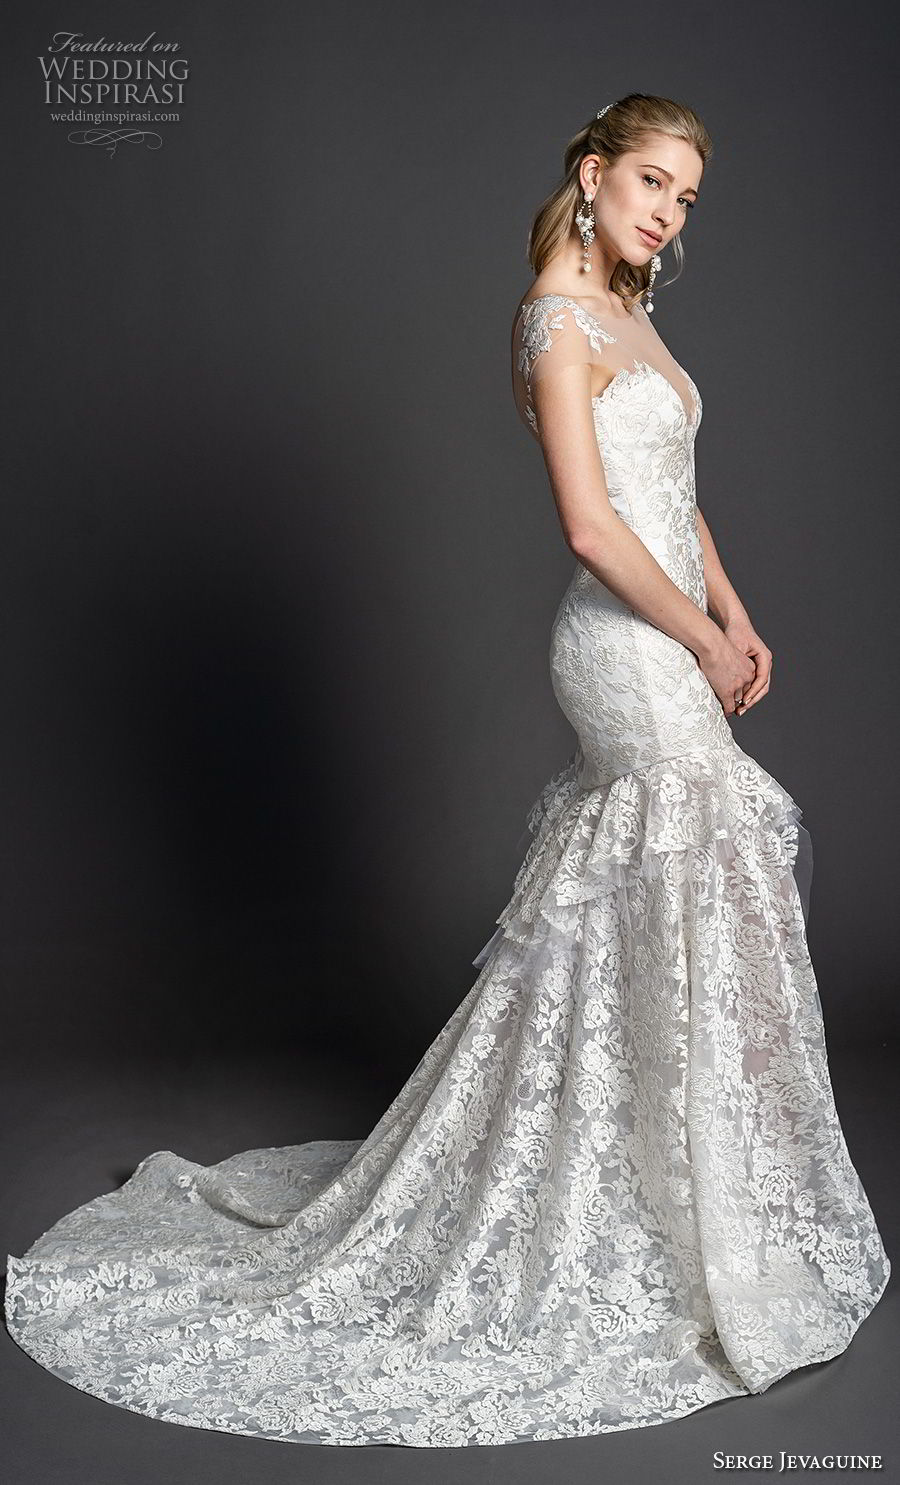 serge jevaguine 2019 bridal cap sleeves illusion bateau deep sweetheart neckline full embellishment elegant mermaid wedding dress open back chapel train (2) sdv